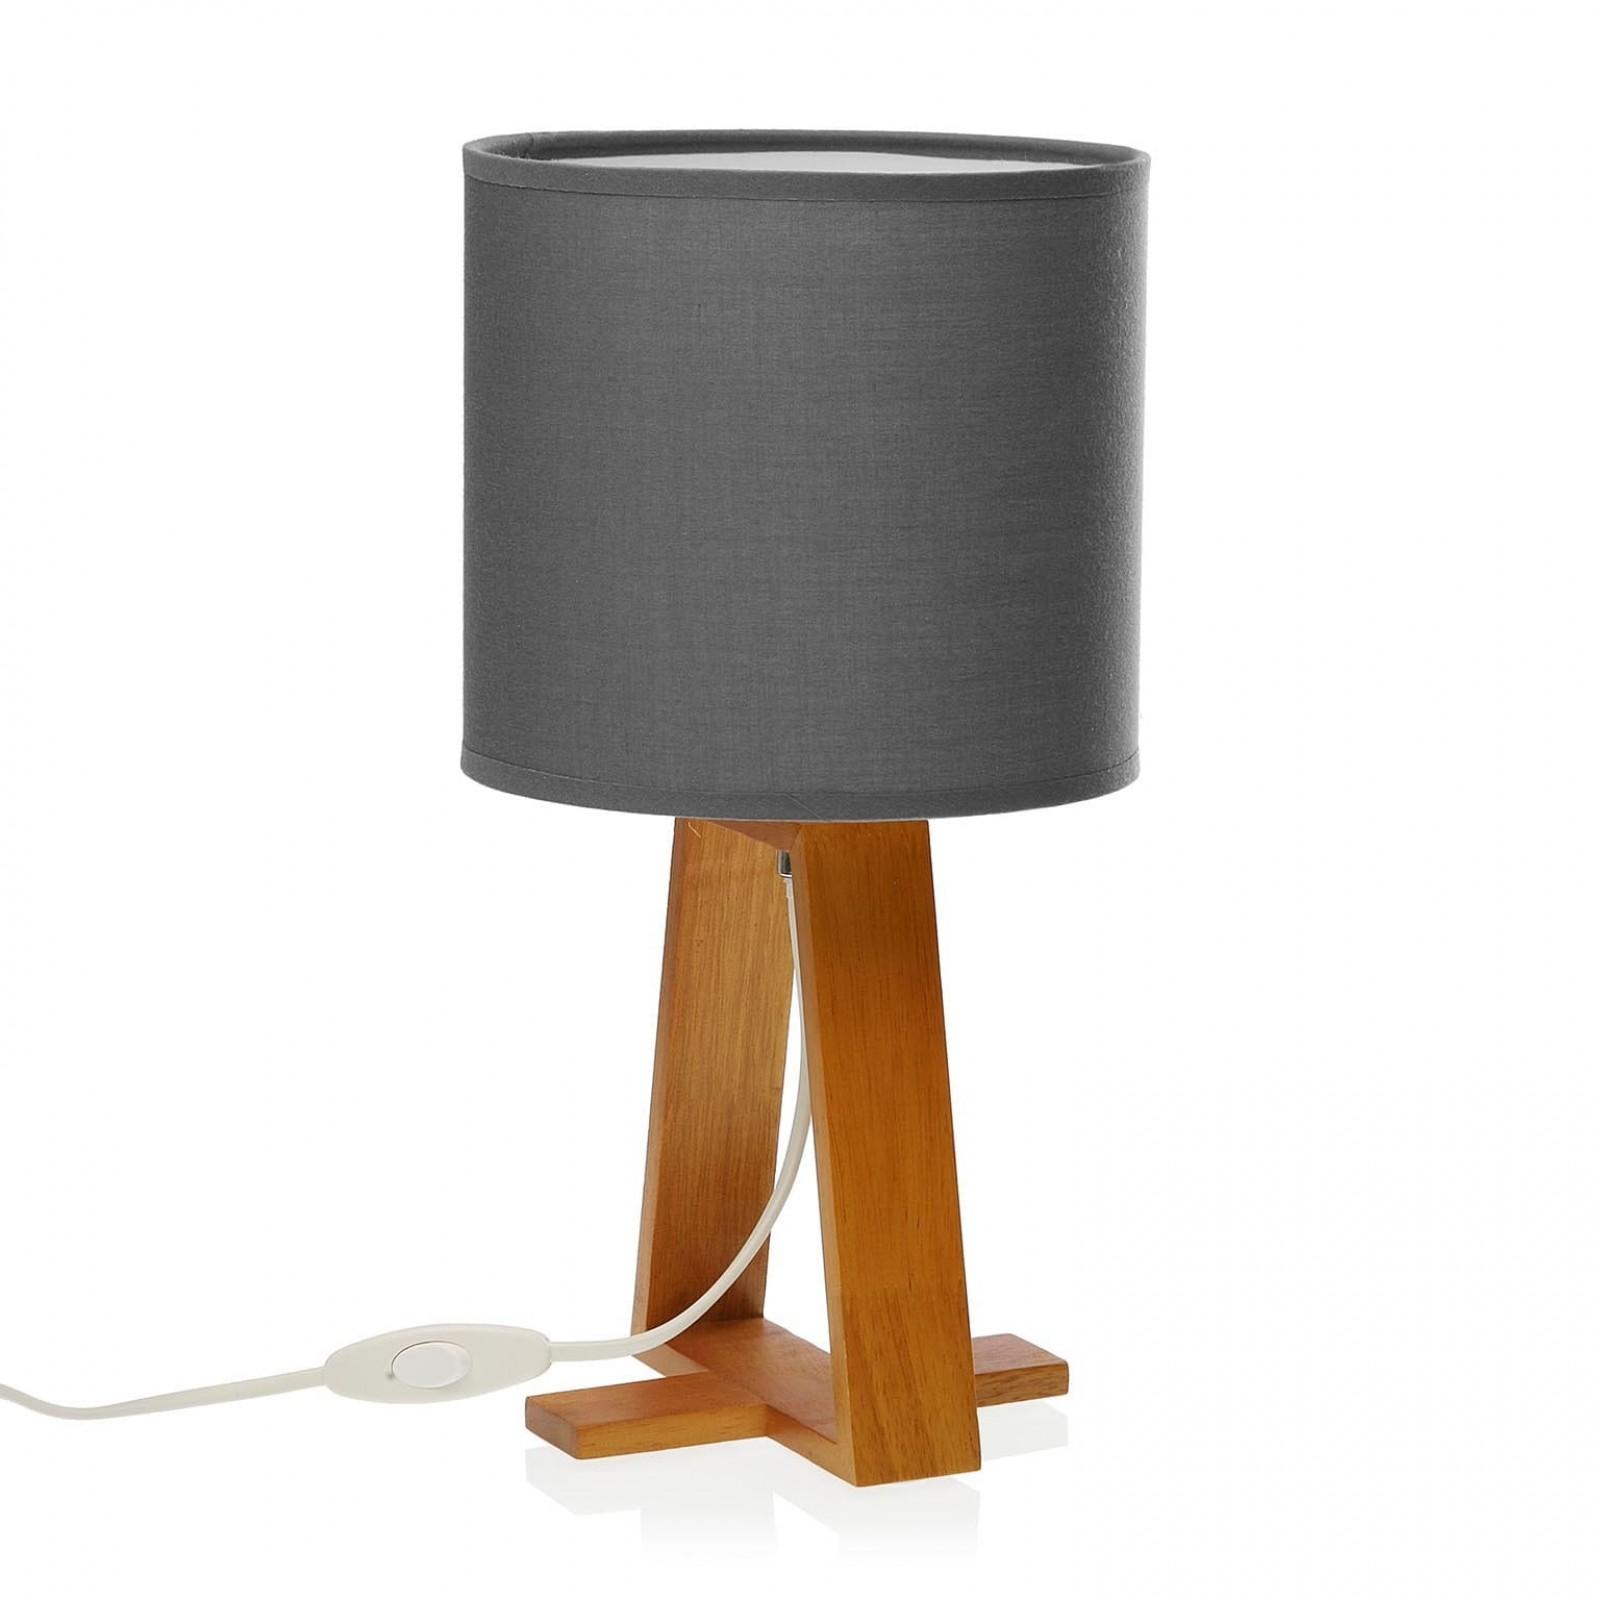 Linear Table Lamp Grey (Wood / Textile) - Versa